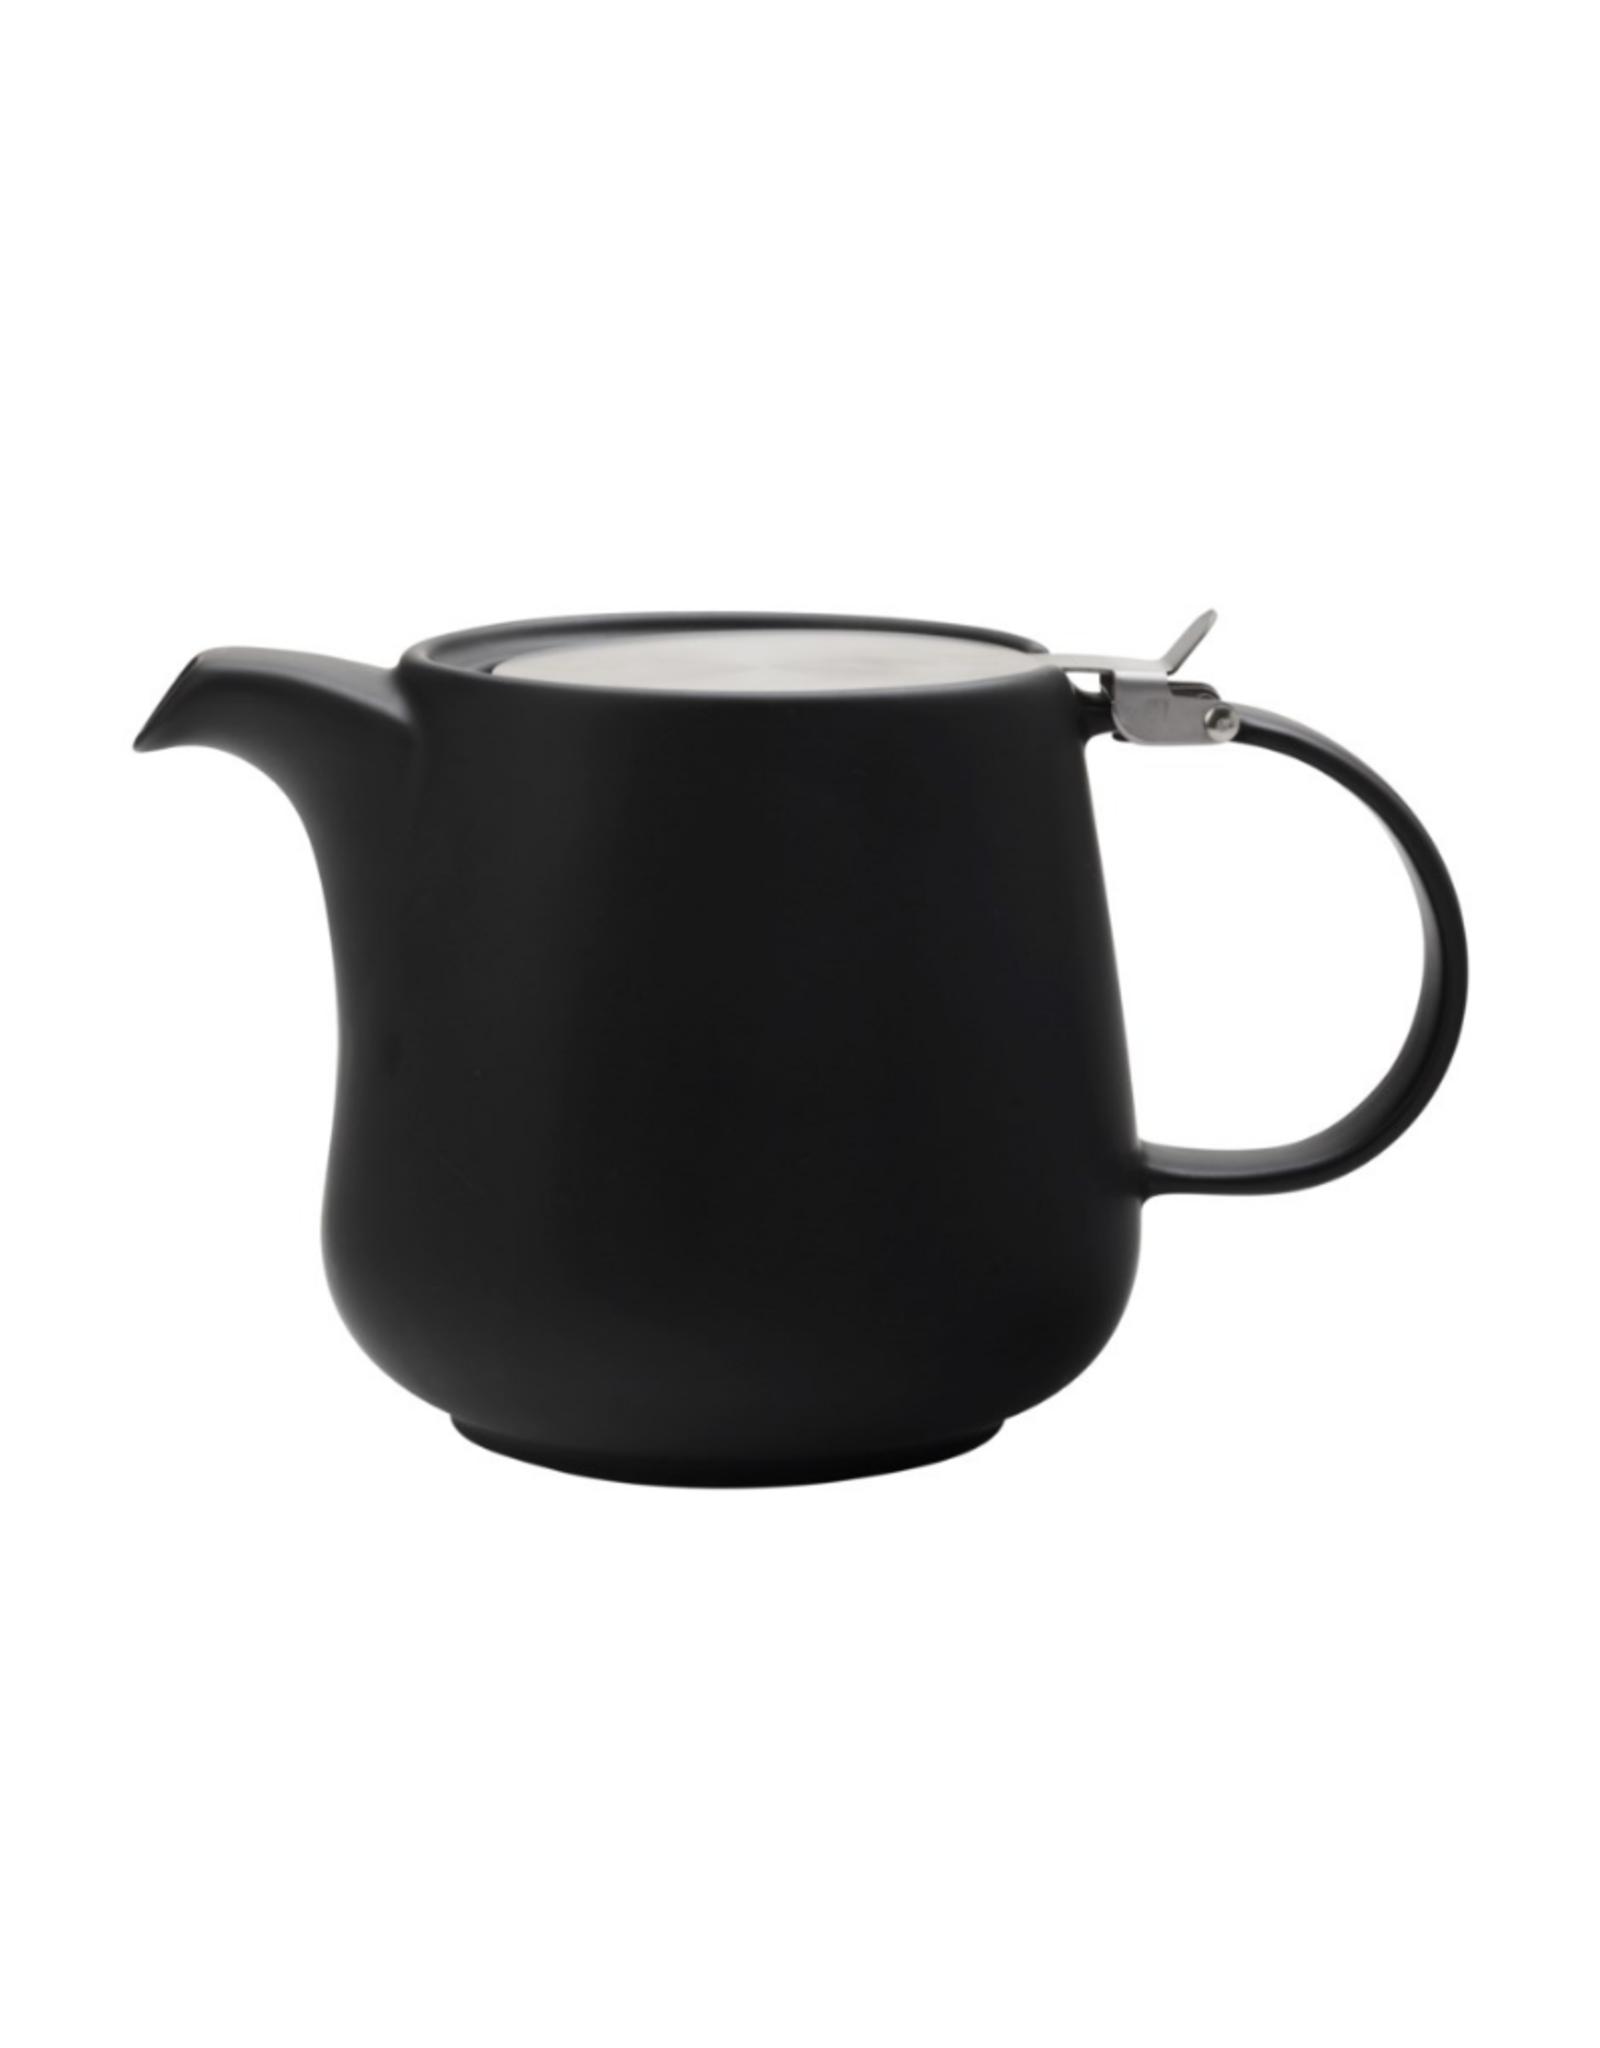 Maxwell Williams Théière 'Tint'  noire 1.2L